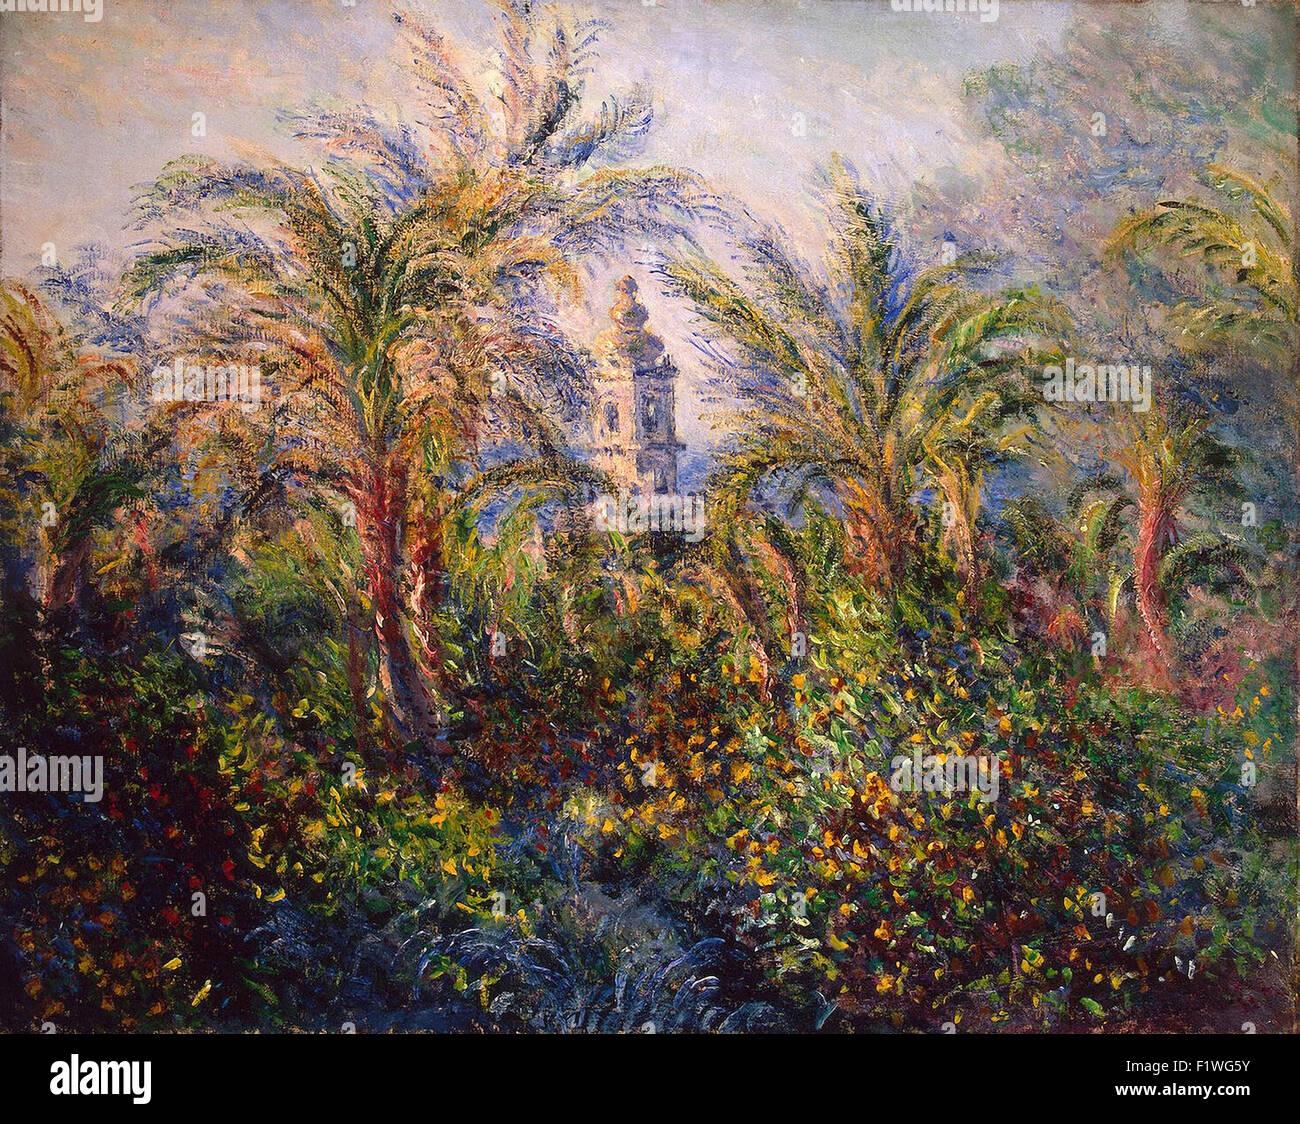 Claude Monet - Garden in Bordighera, Impression of Morning - Stock Image